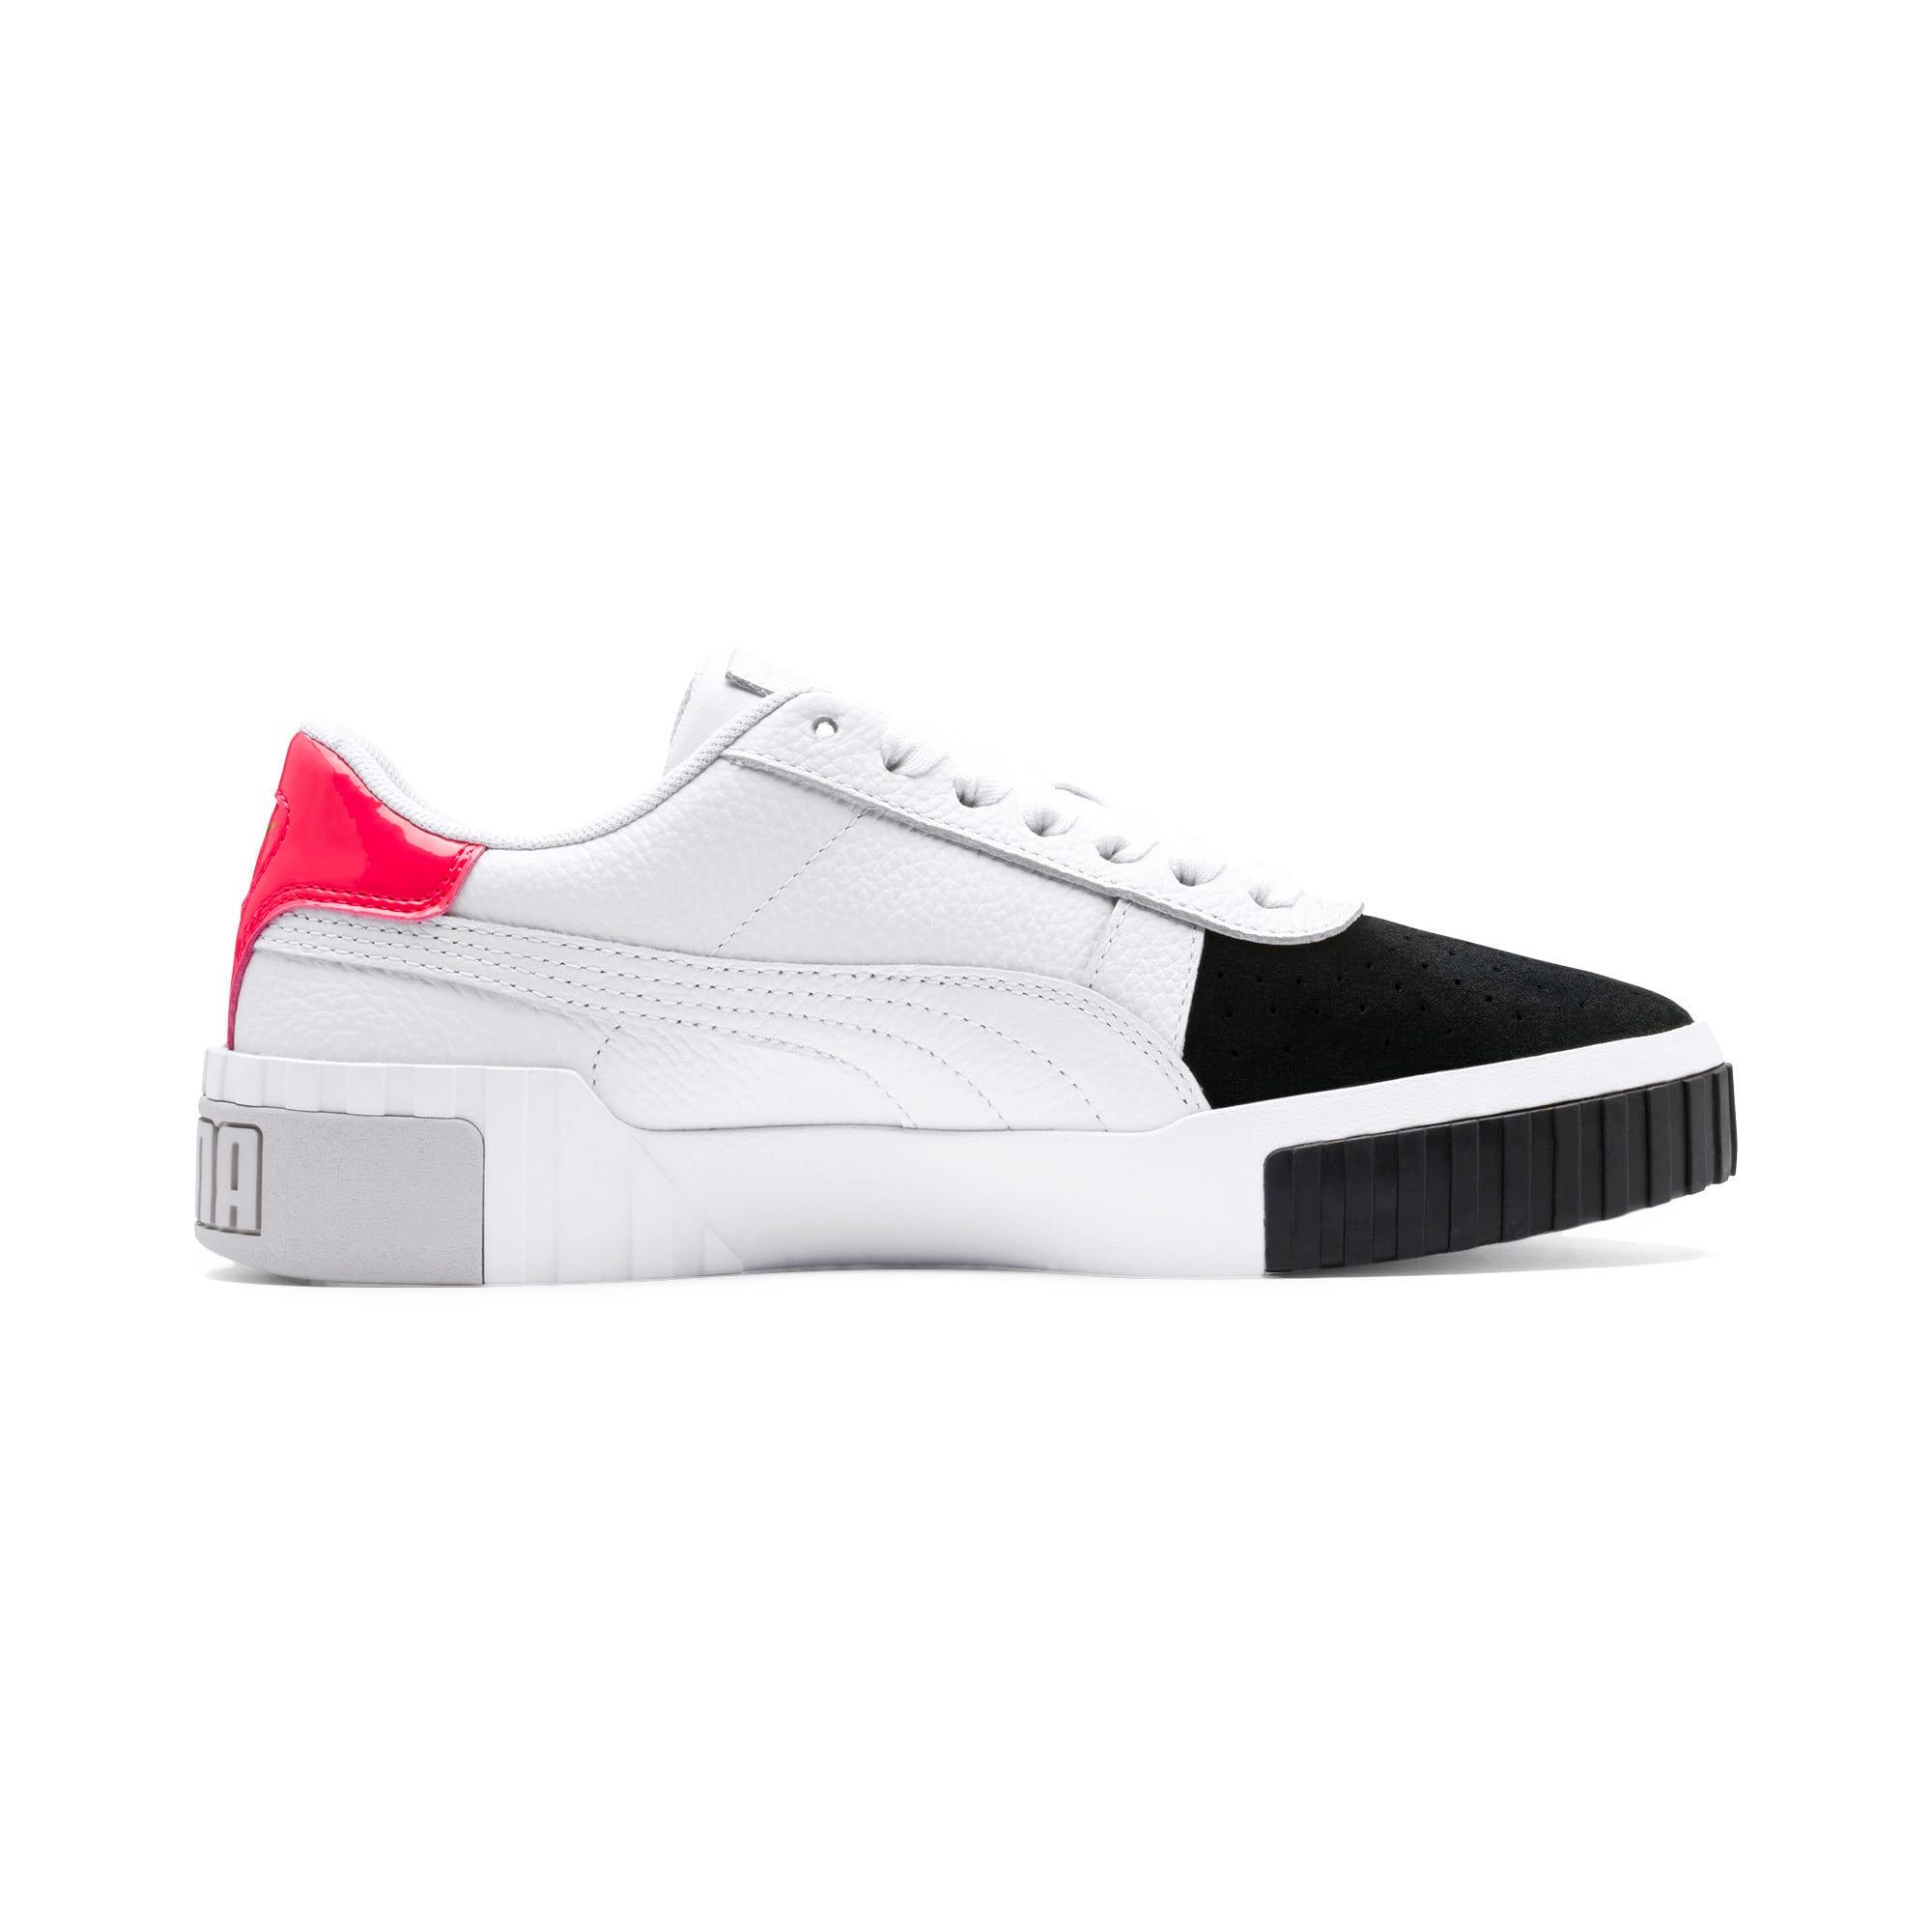 Thumbnail 6 of Cali Remix Women's Sneakers, Puma White-Puma Black, medium